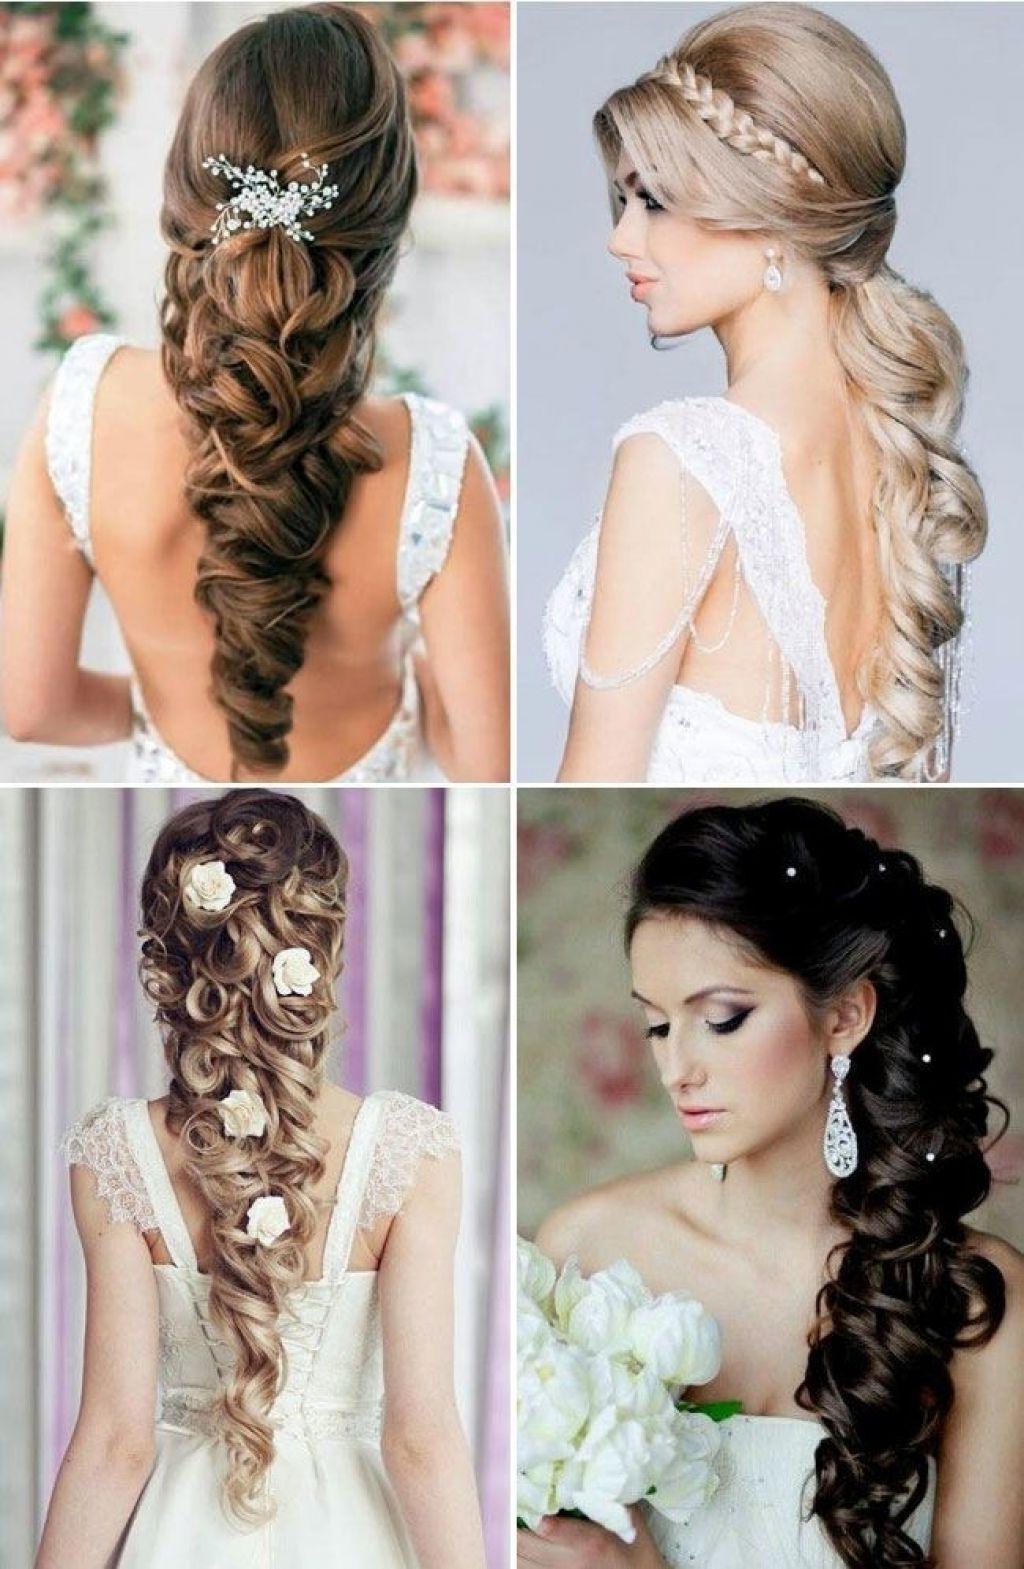 Bridesmaid Hairstyle For Long Hair Bridesmaid Hairstyles Updos For With Hairstyles For Bridesmaids Updos (View 5 of 15)